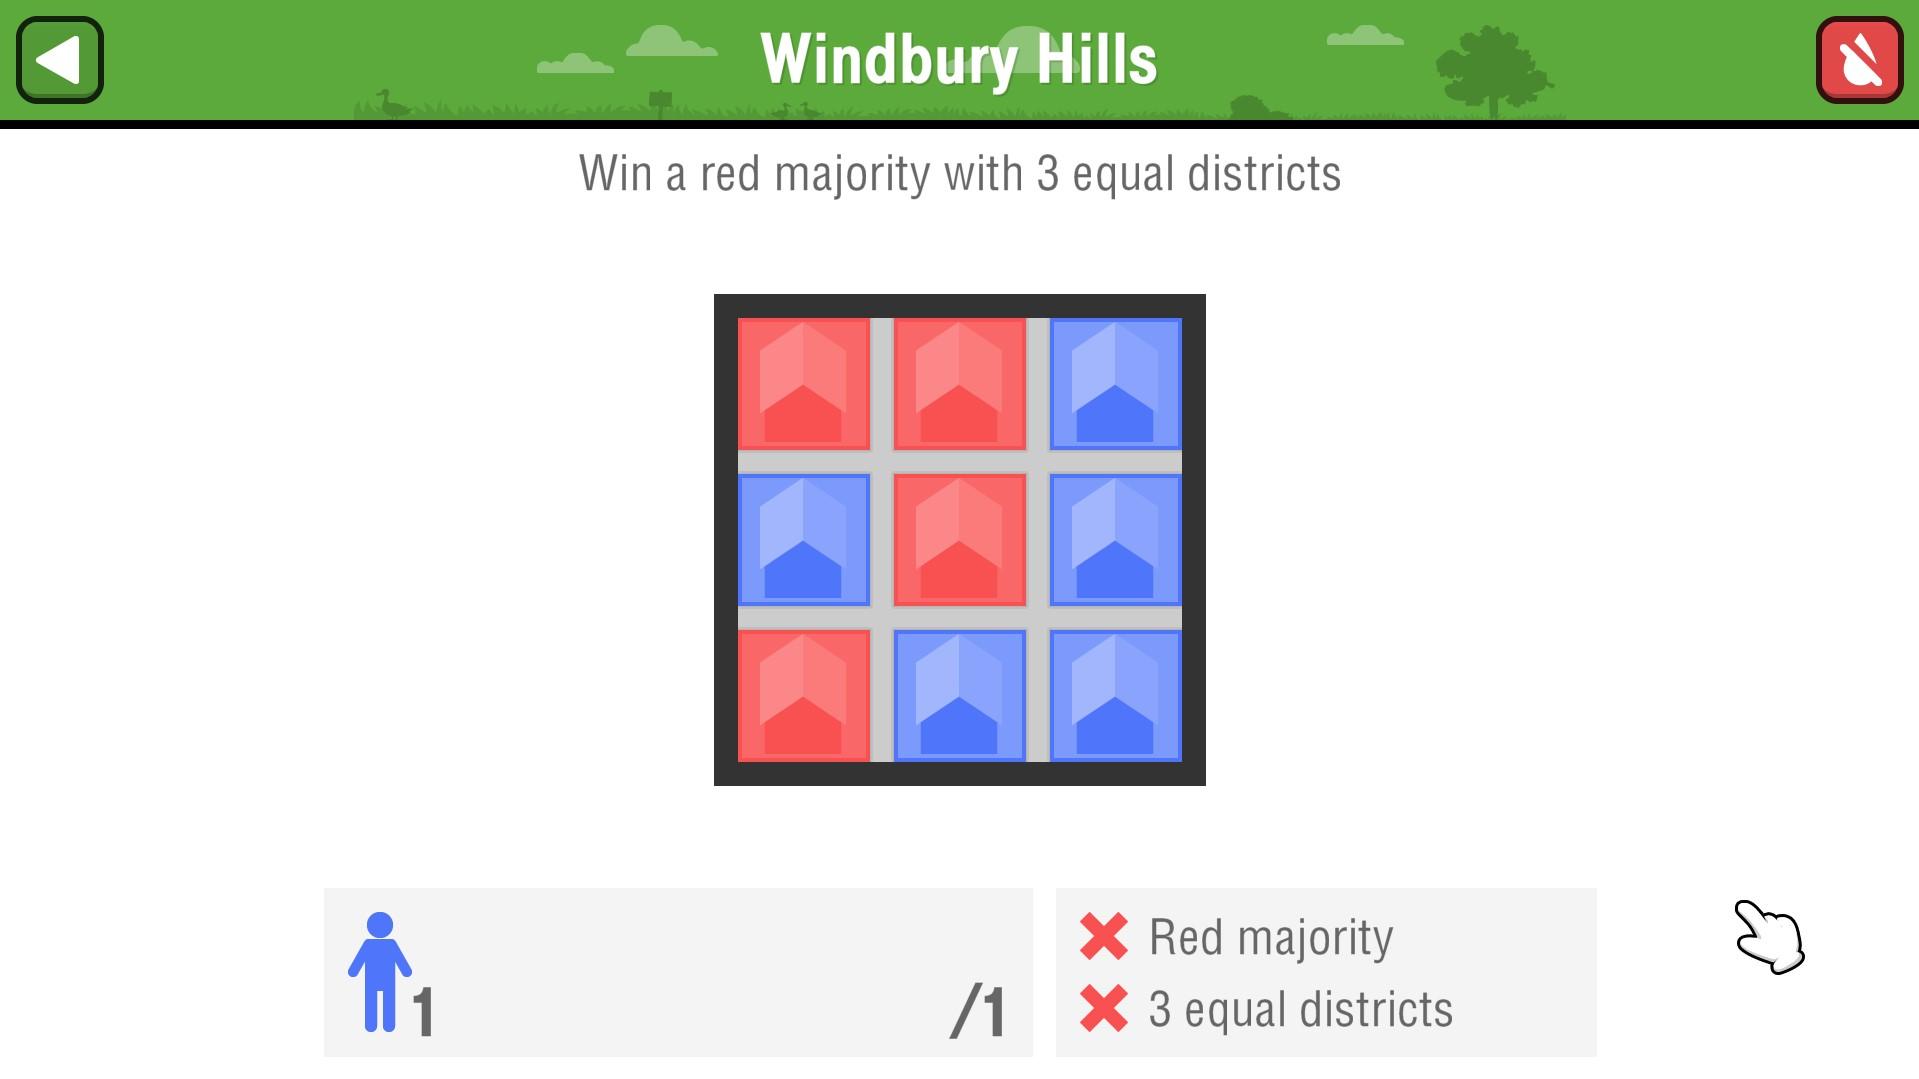 Windbury Hills